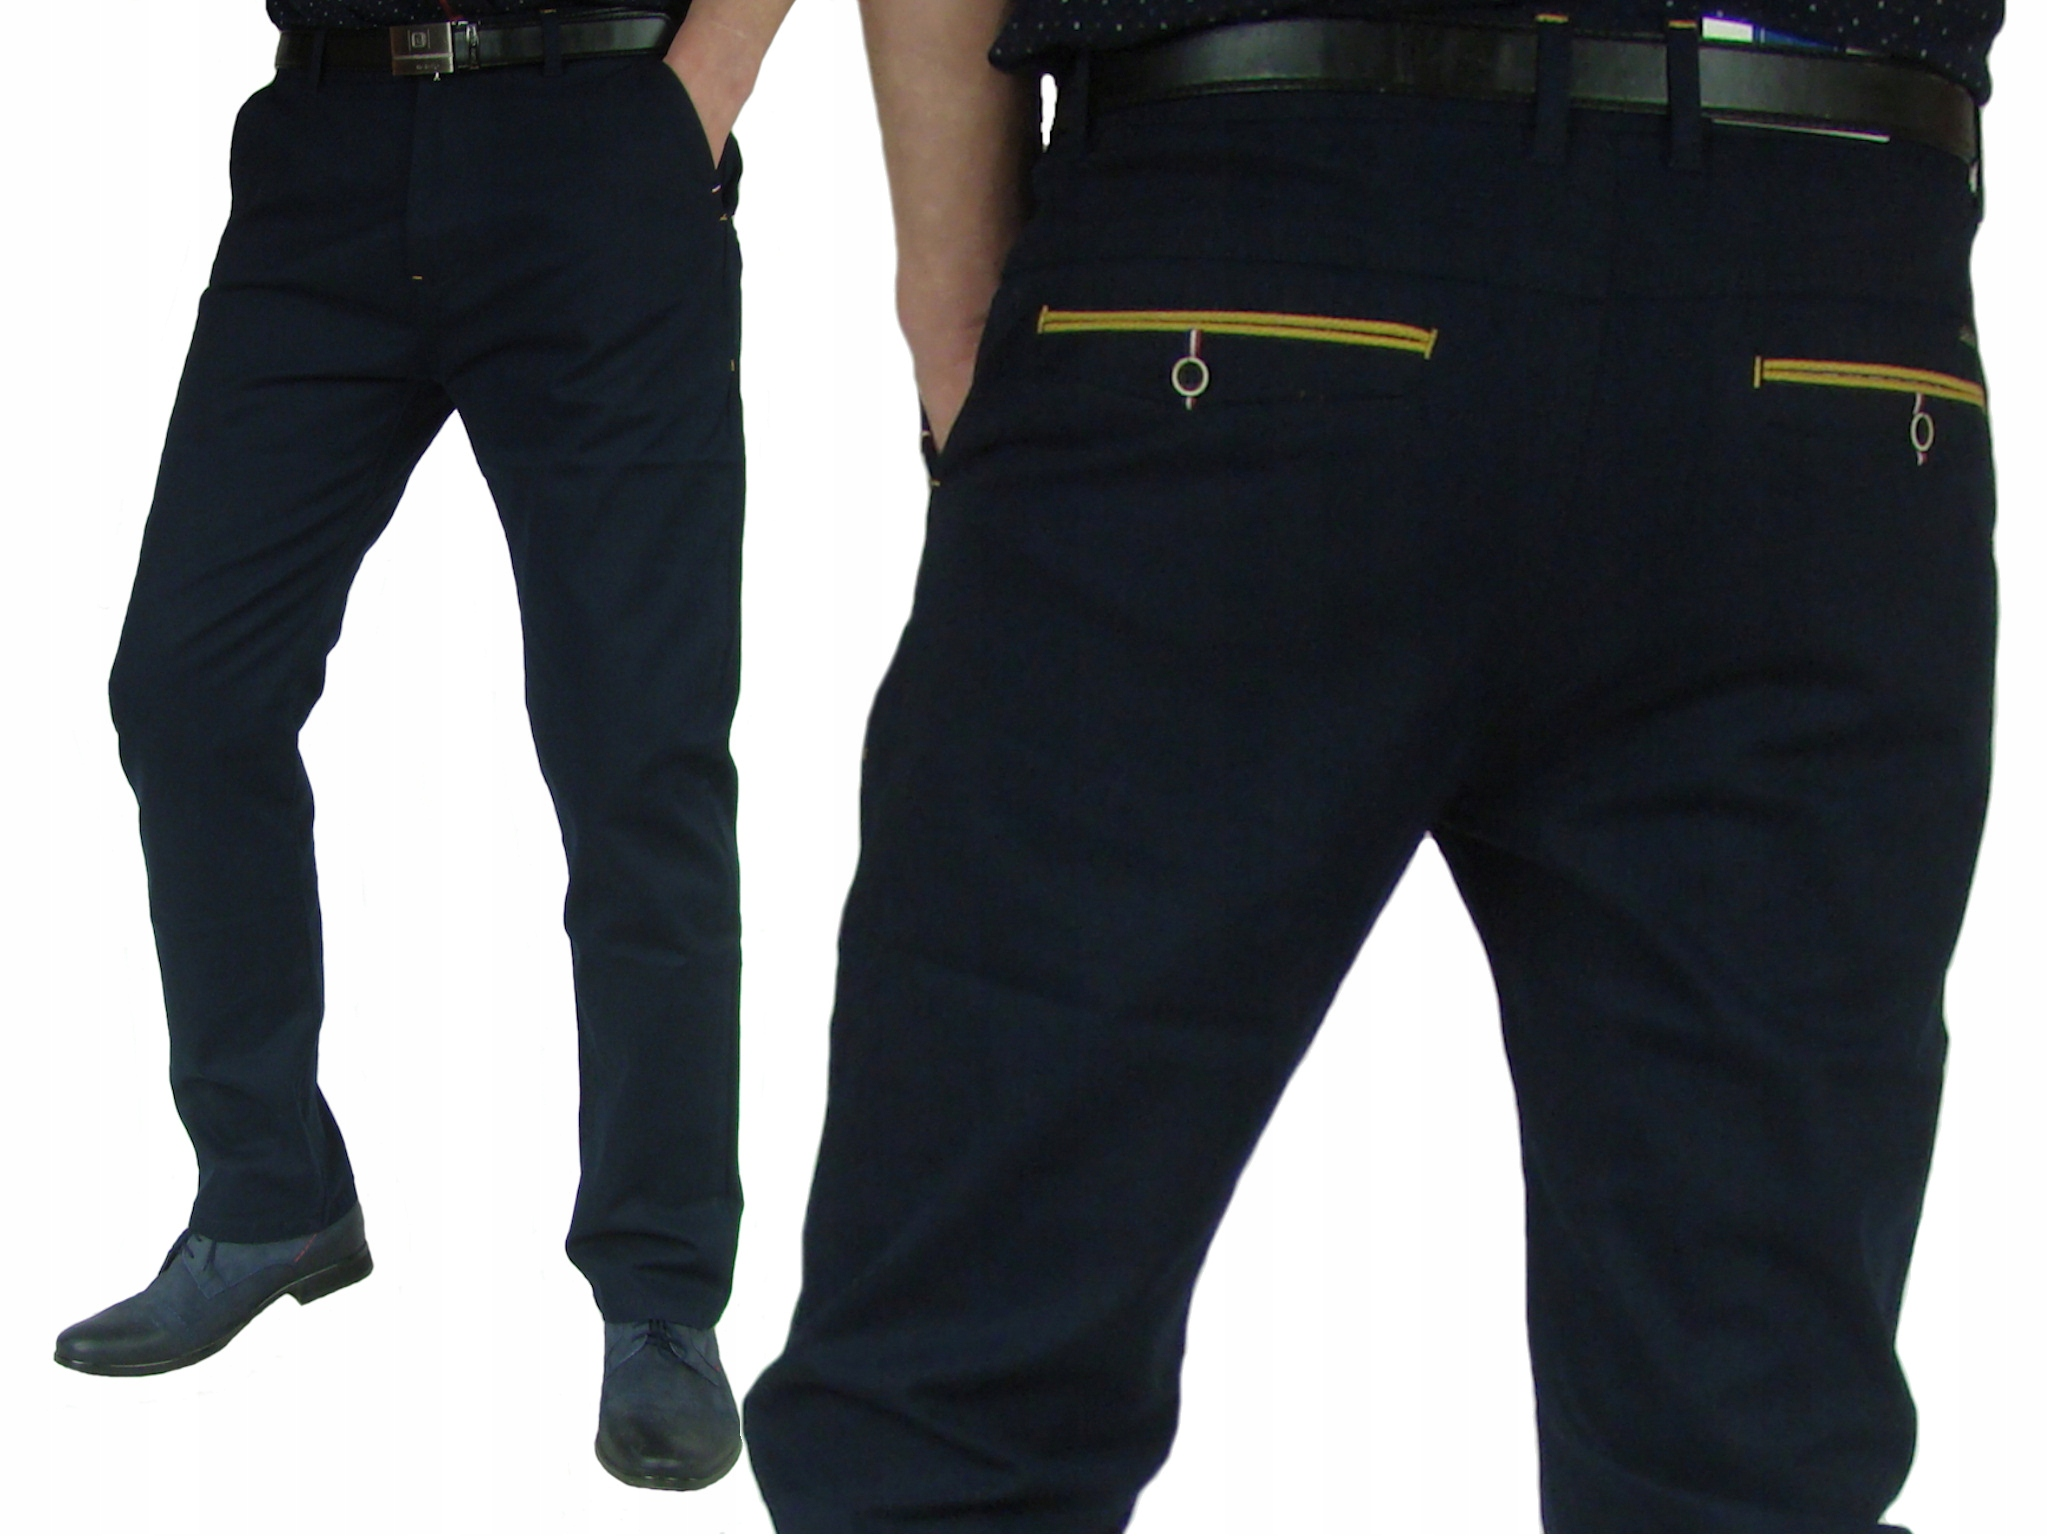 40/30 pas 104cm Spodnie Granat Casual Landers -822